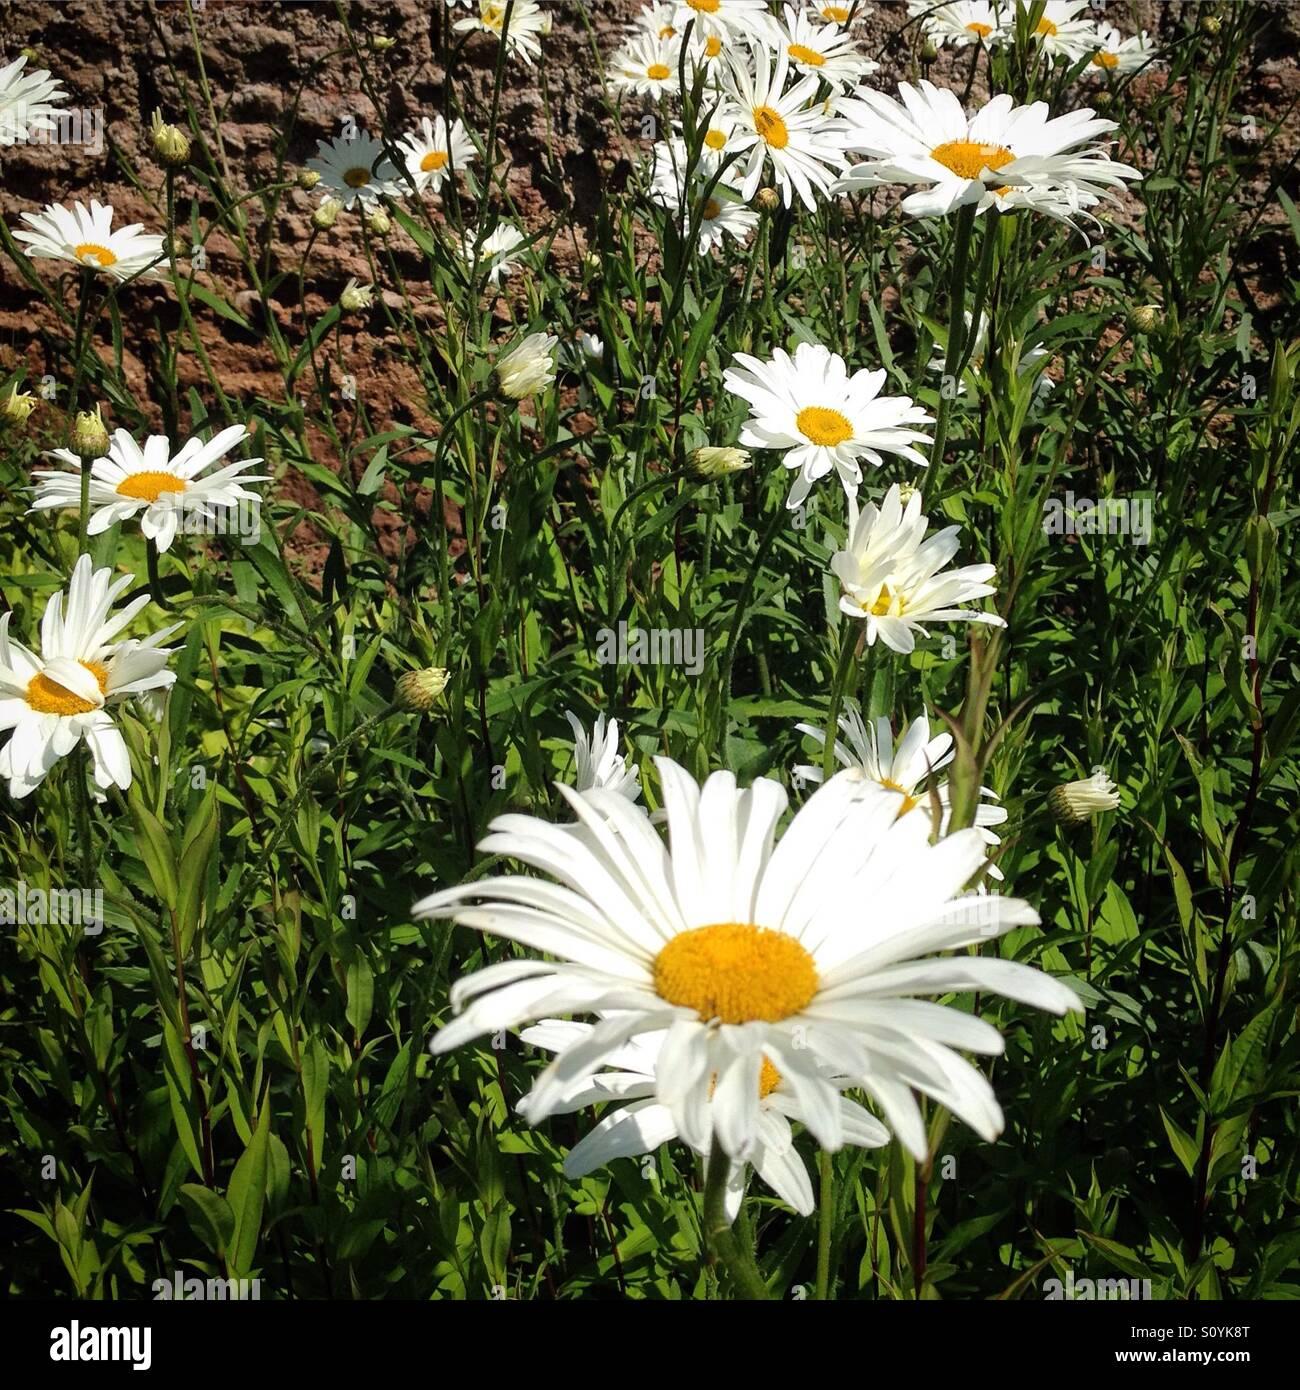 Large daisy type flowers in a summer garden stock photo royalty large daisy type flowers in a summer garden dhlflorist Images